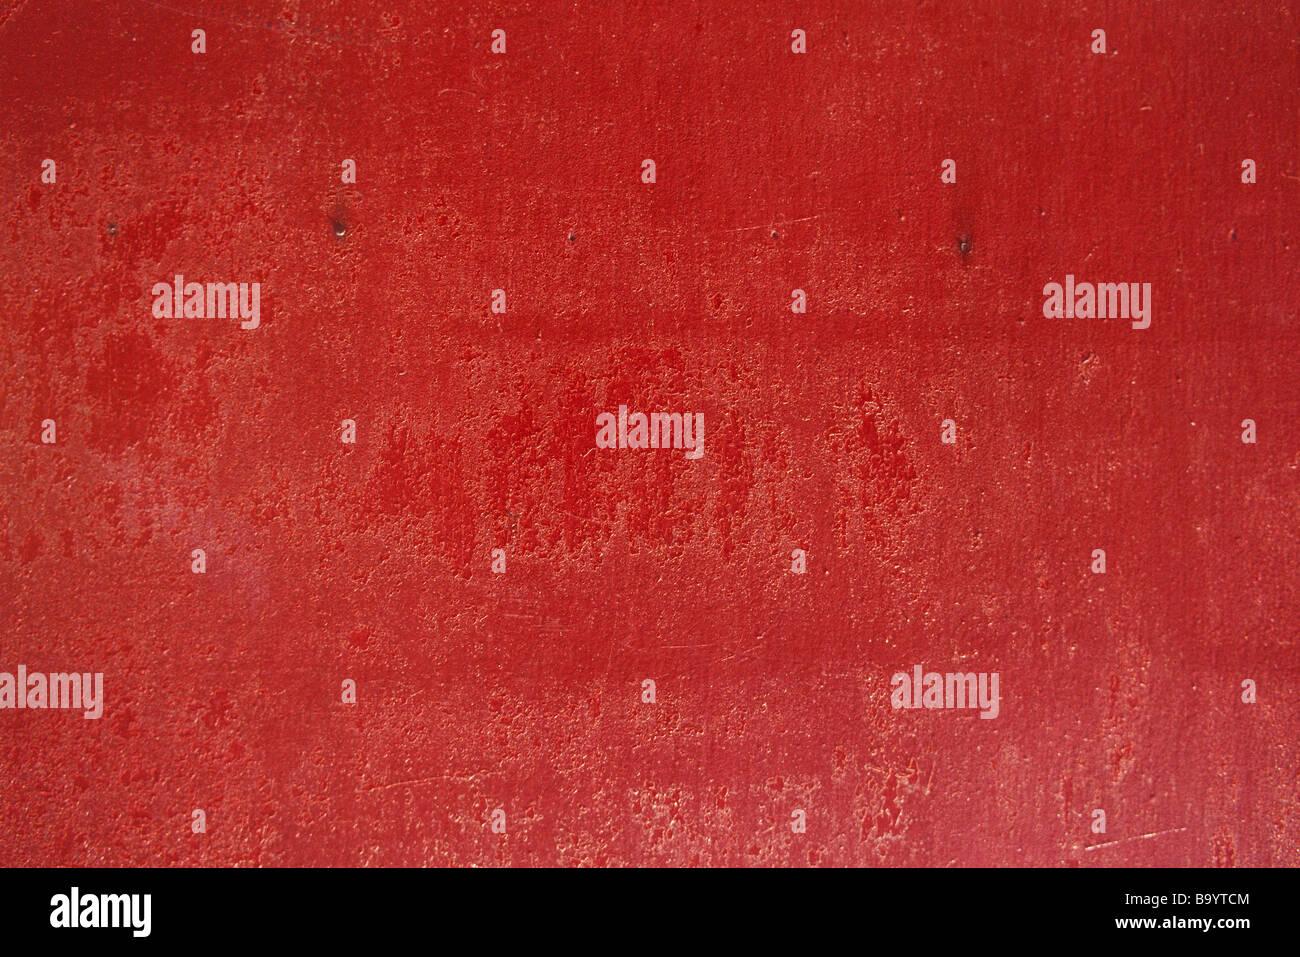 Superficies pintadas de rojo Imagen De Stock